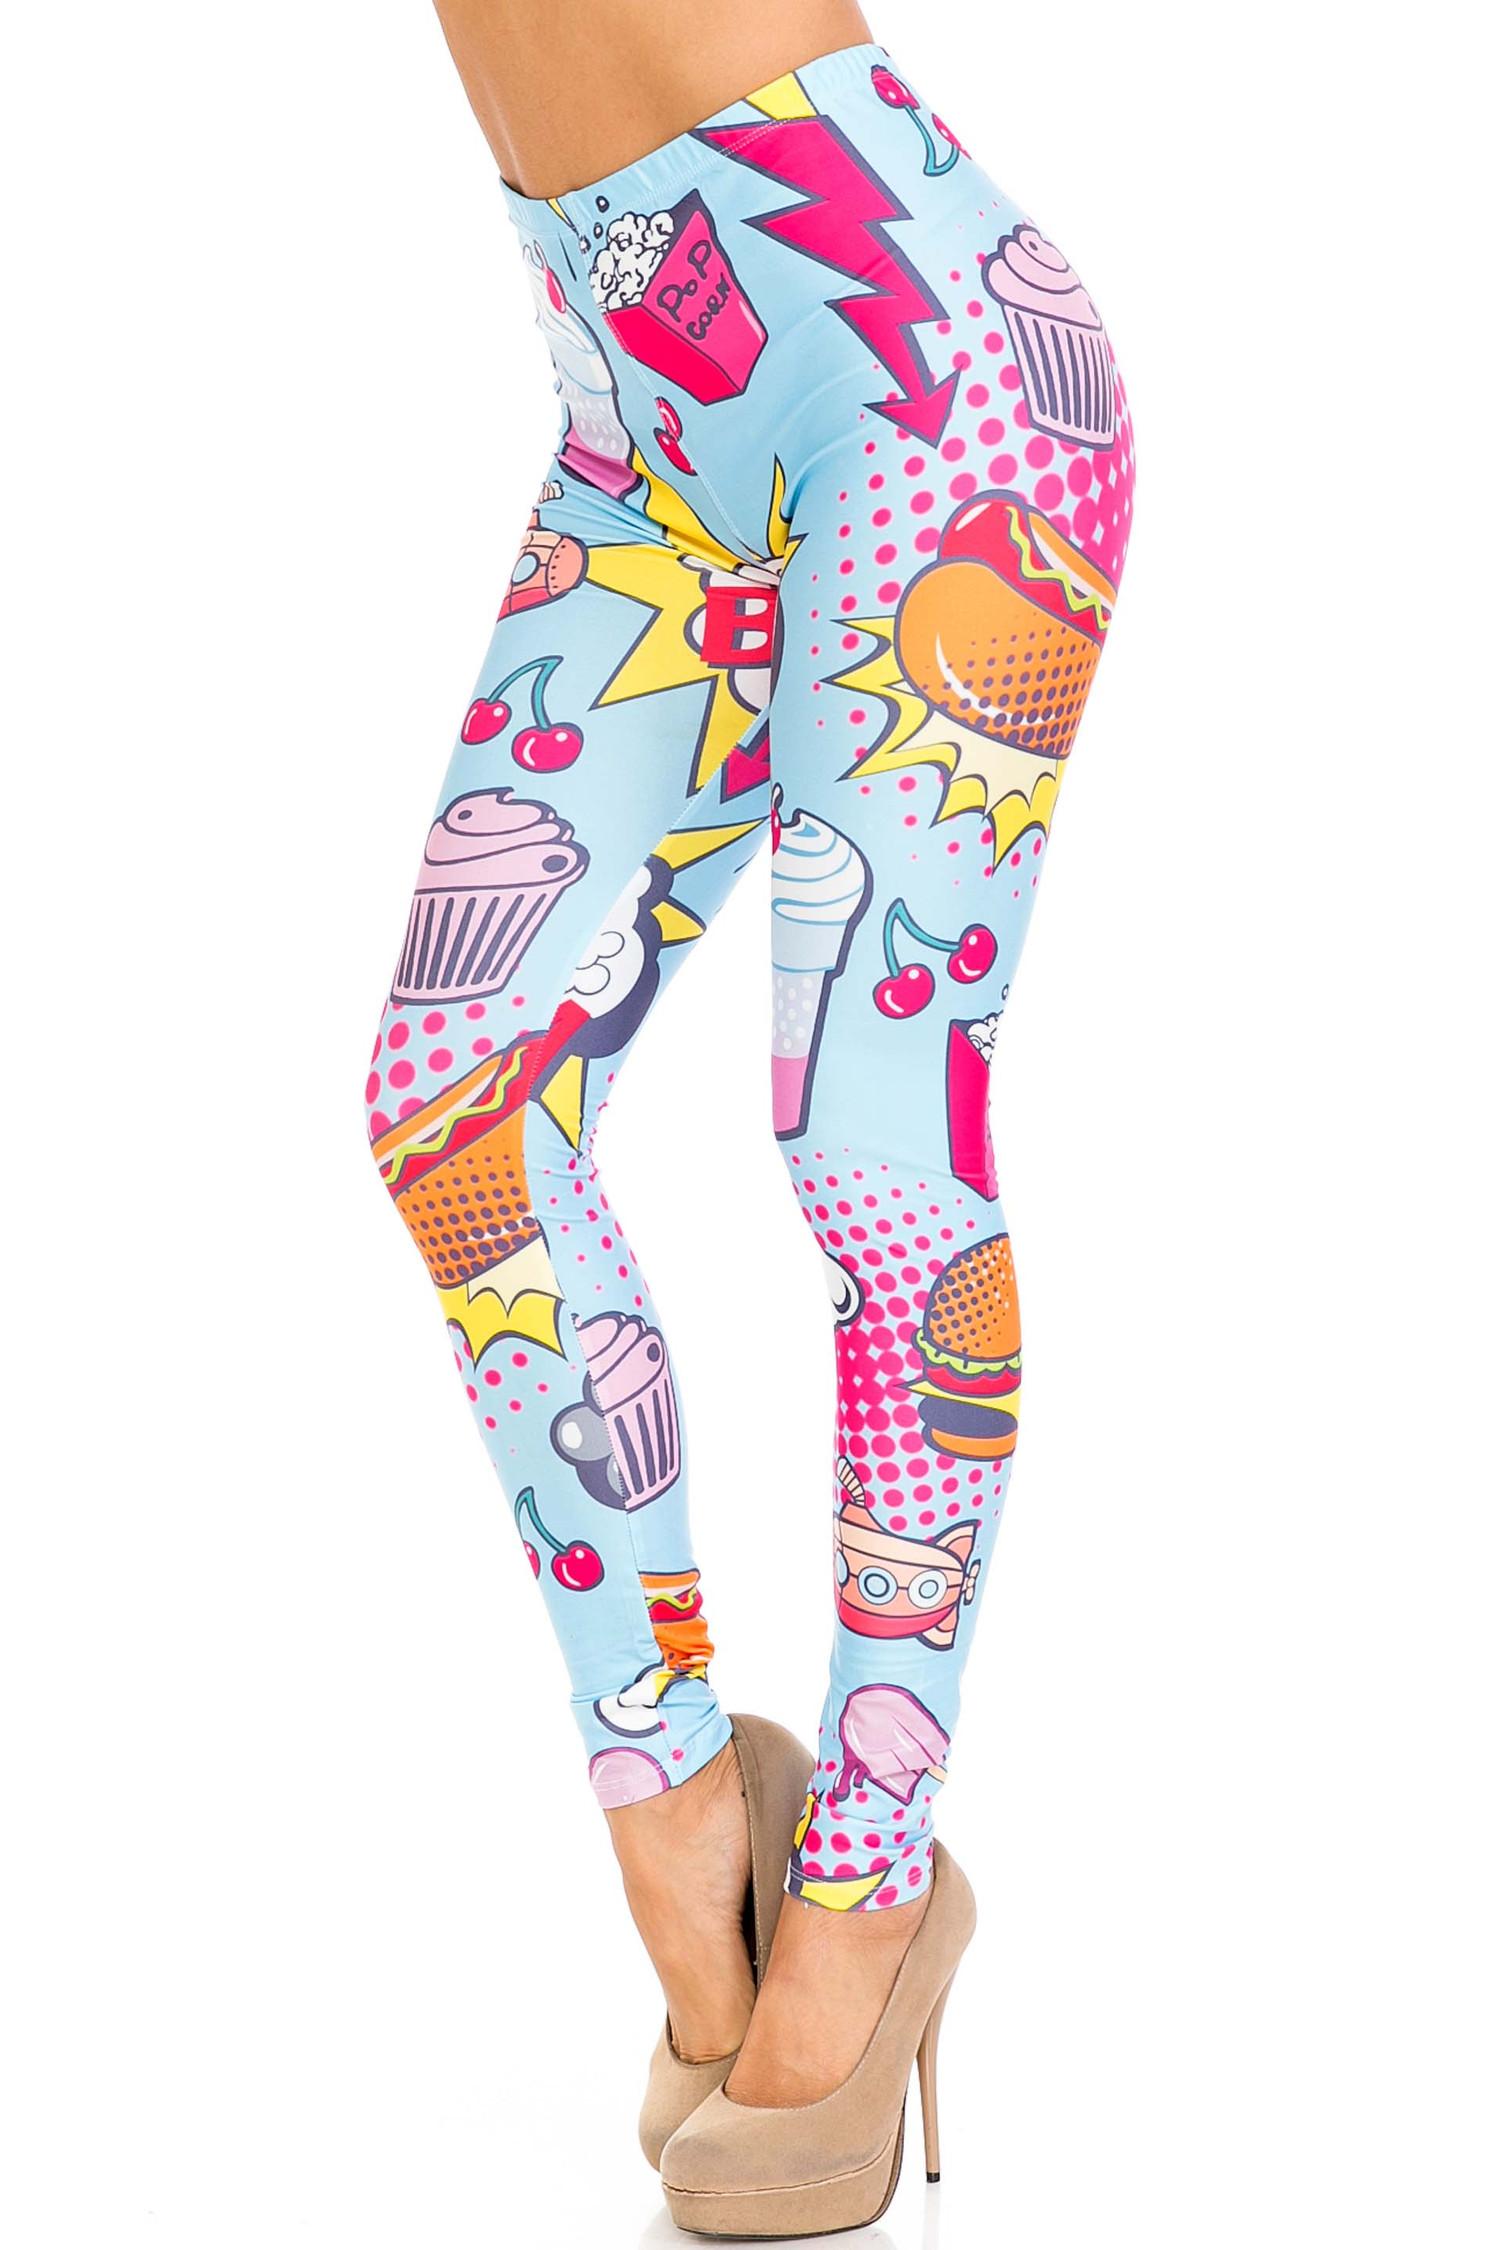 Creamy Soft Fast Food Comic Extra Plus Size Leggings - 3X-5X - USA Fashion™